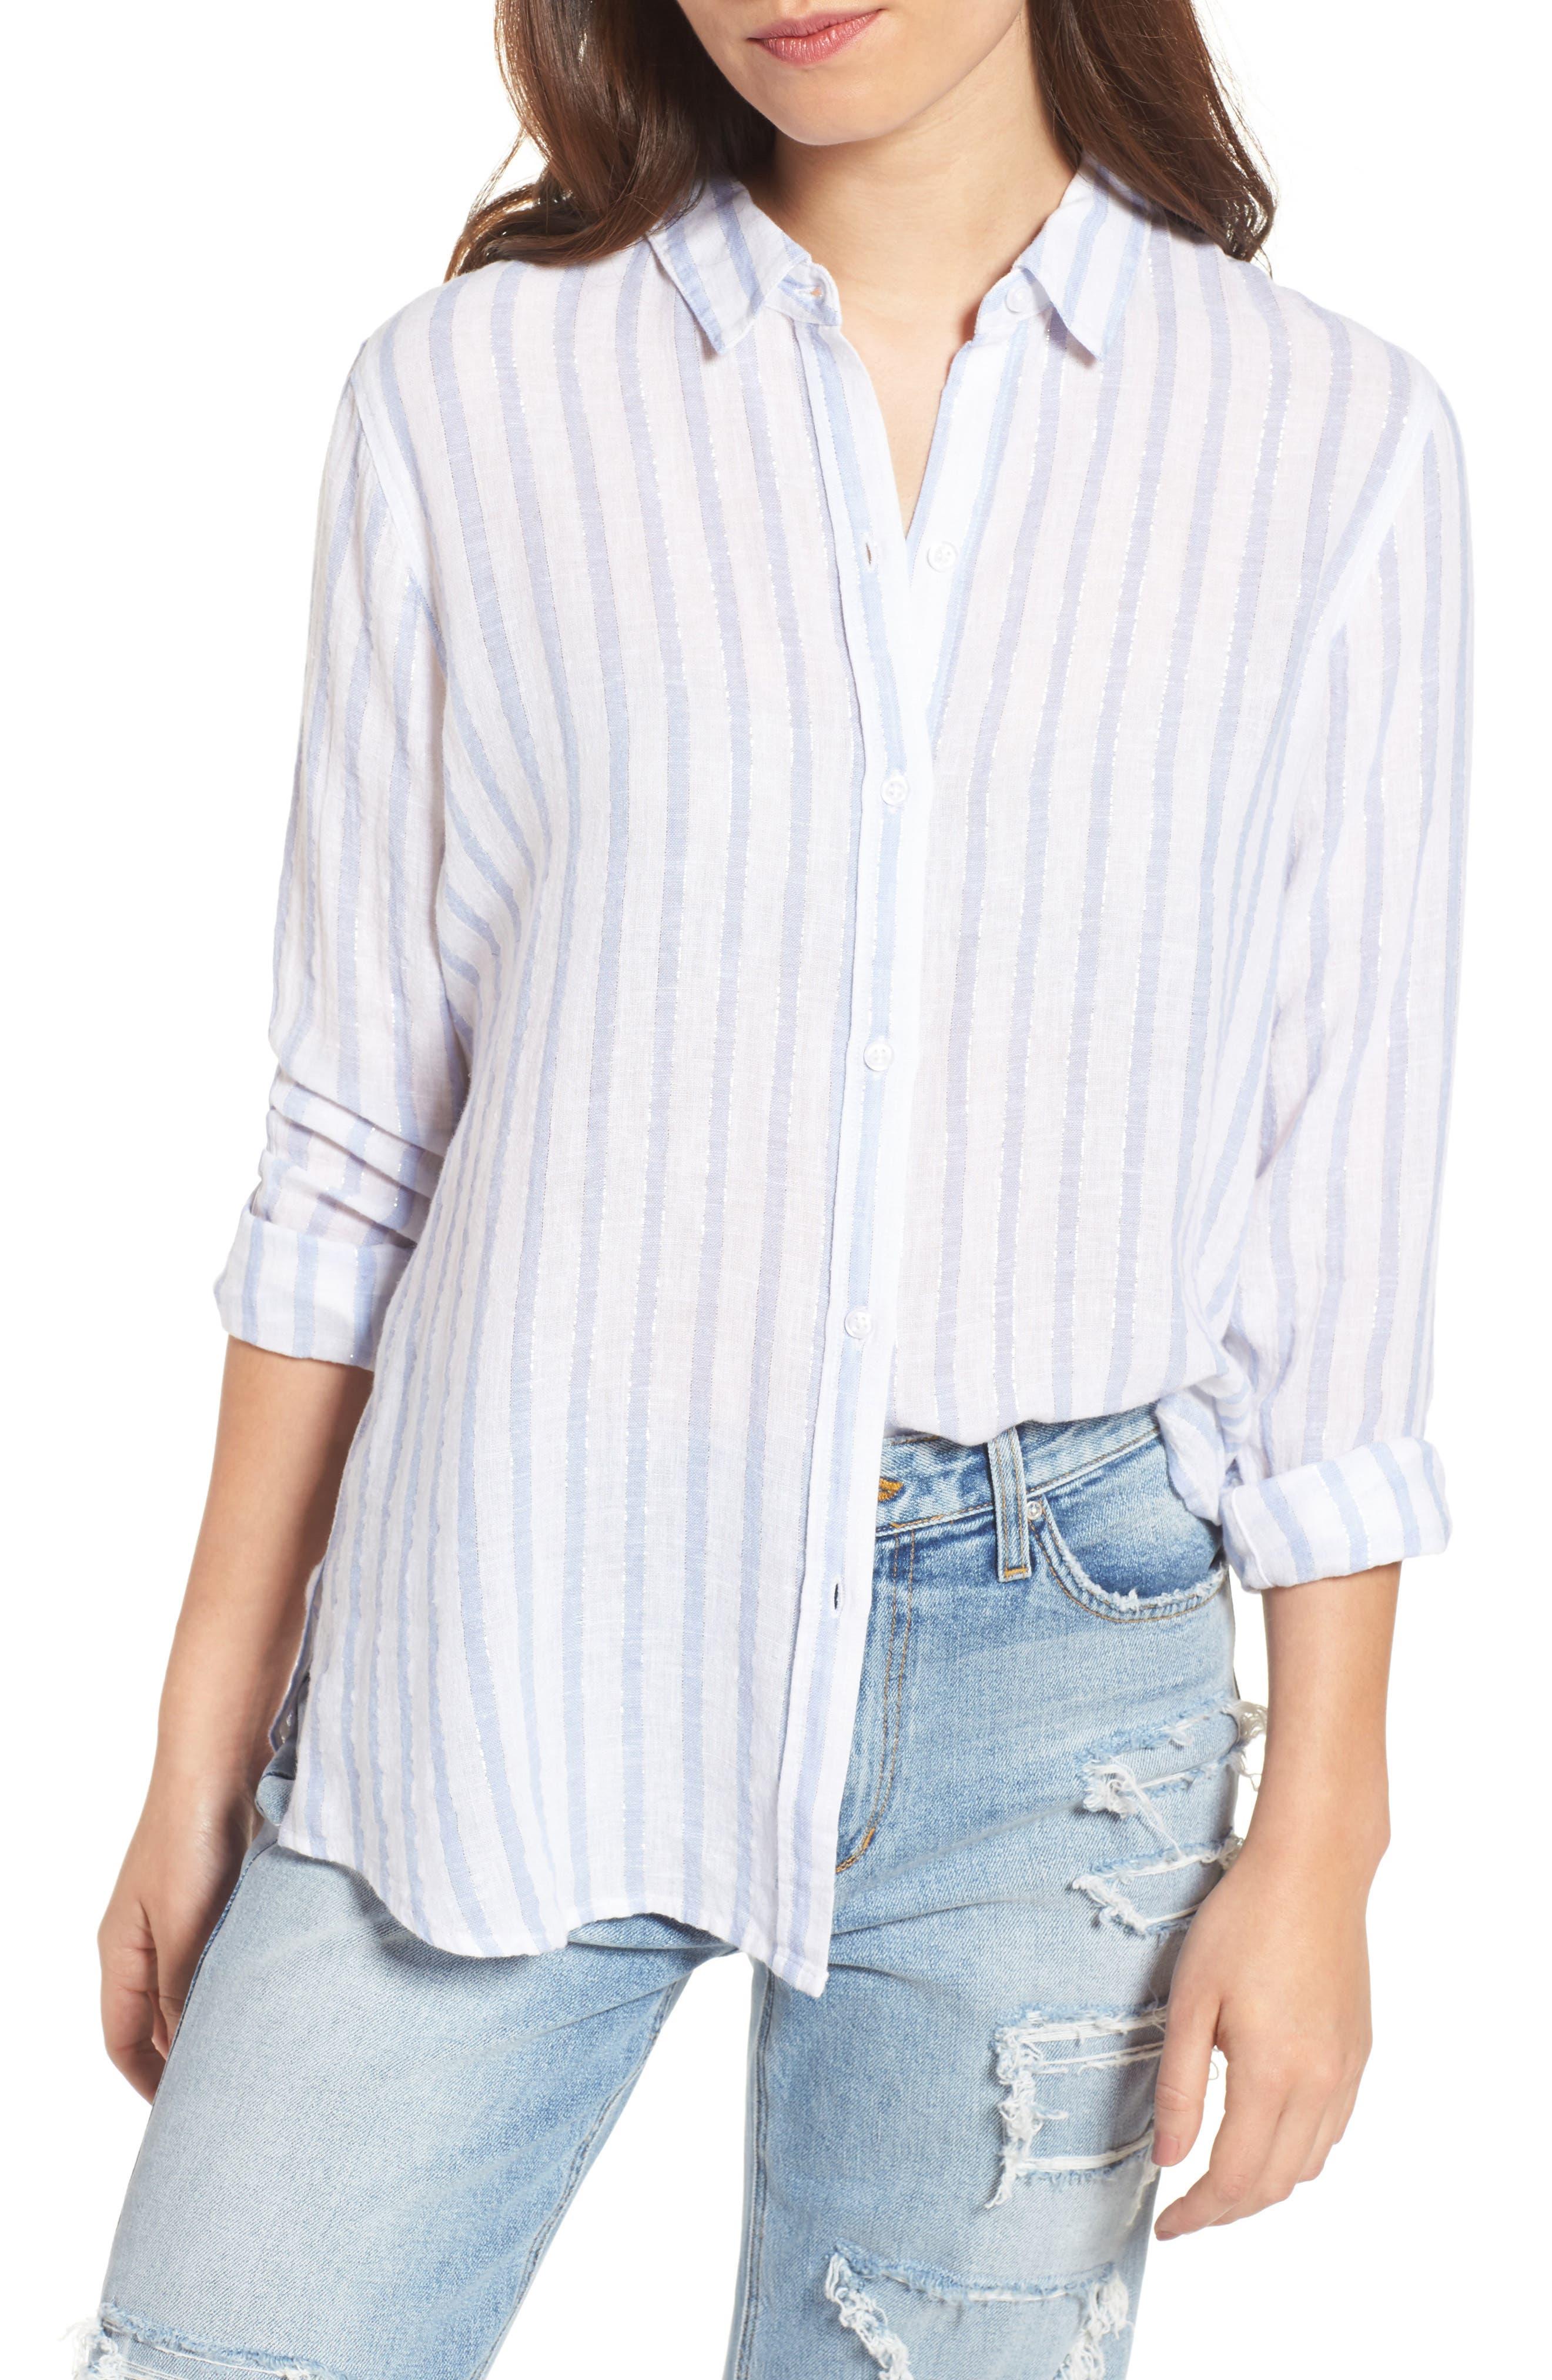 Alternate Image 1 Selected - Rails Sydney Vertical Shimmer Stripe Linen Blend Shirt